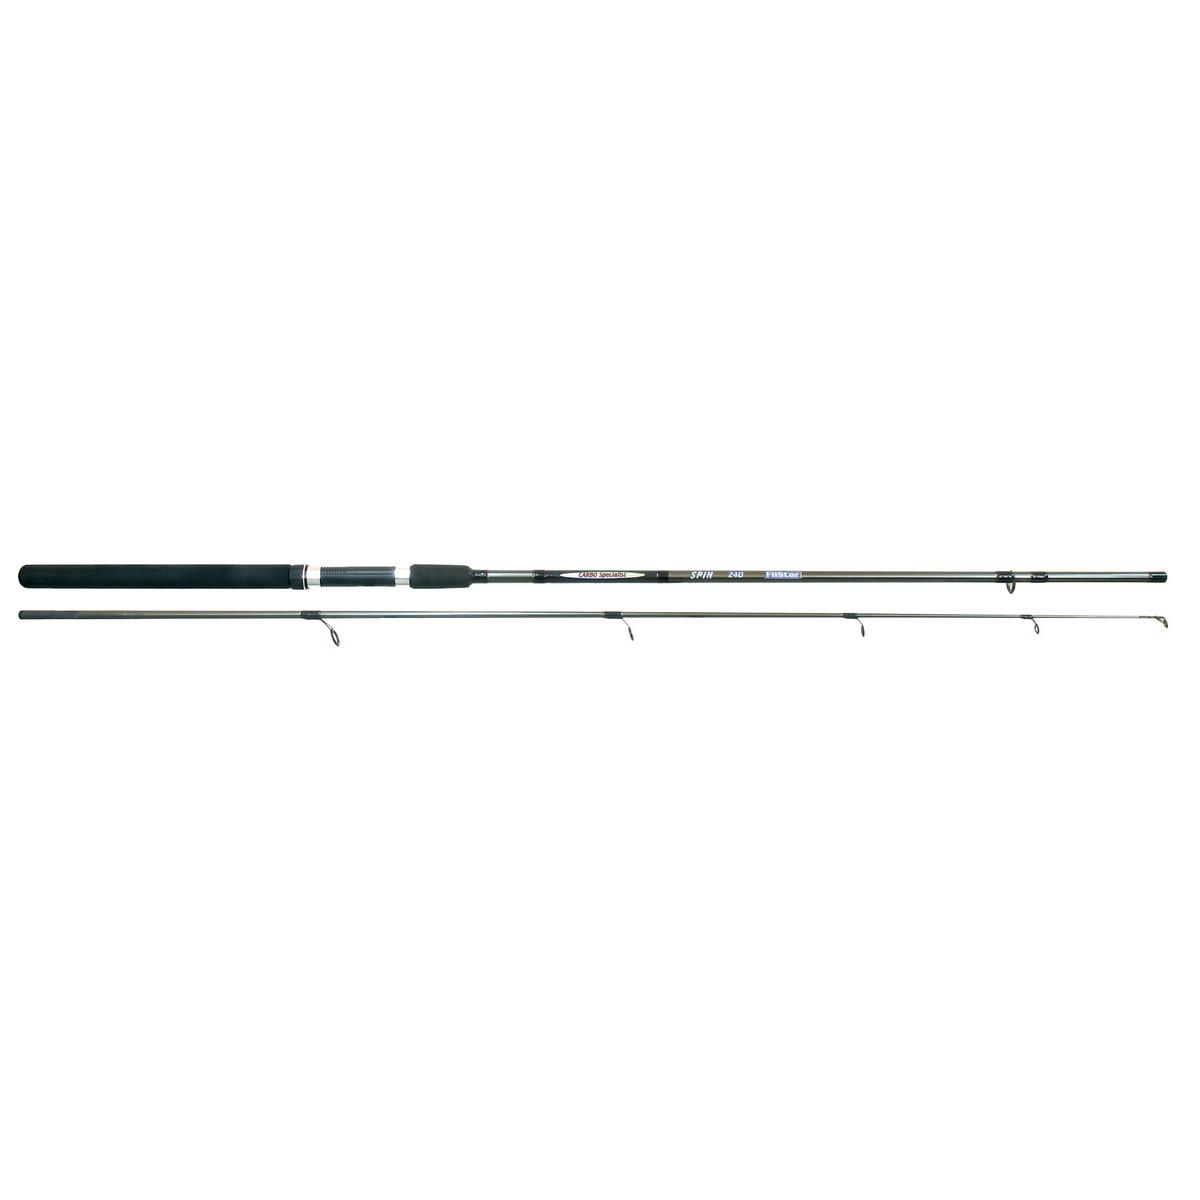 Риболовен прът Filstar Carbo Specialst Spin 2.40m